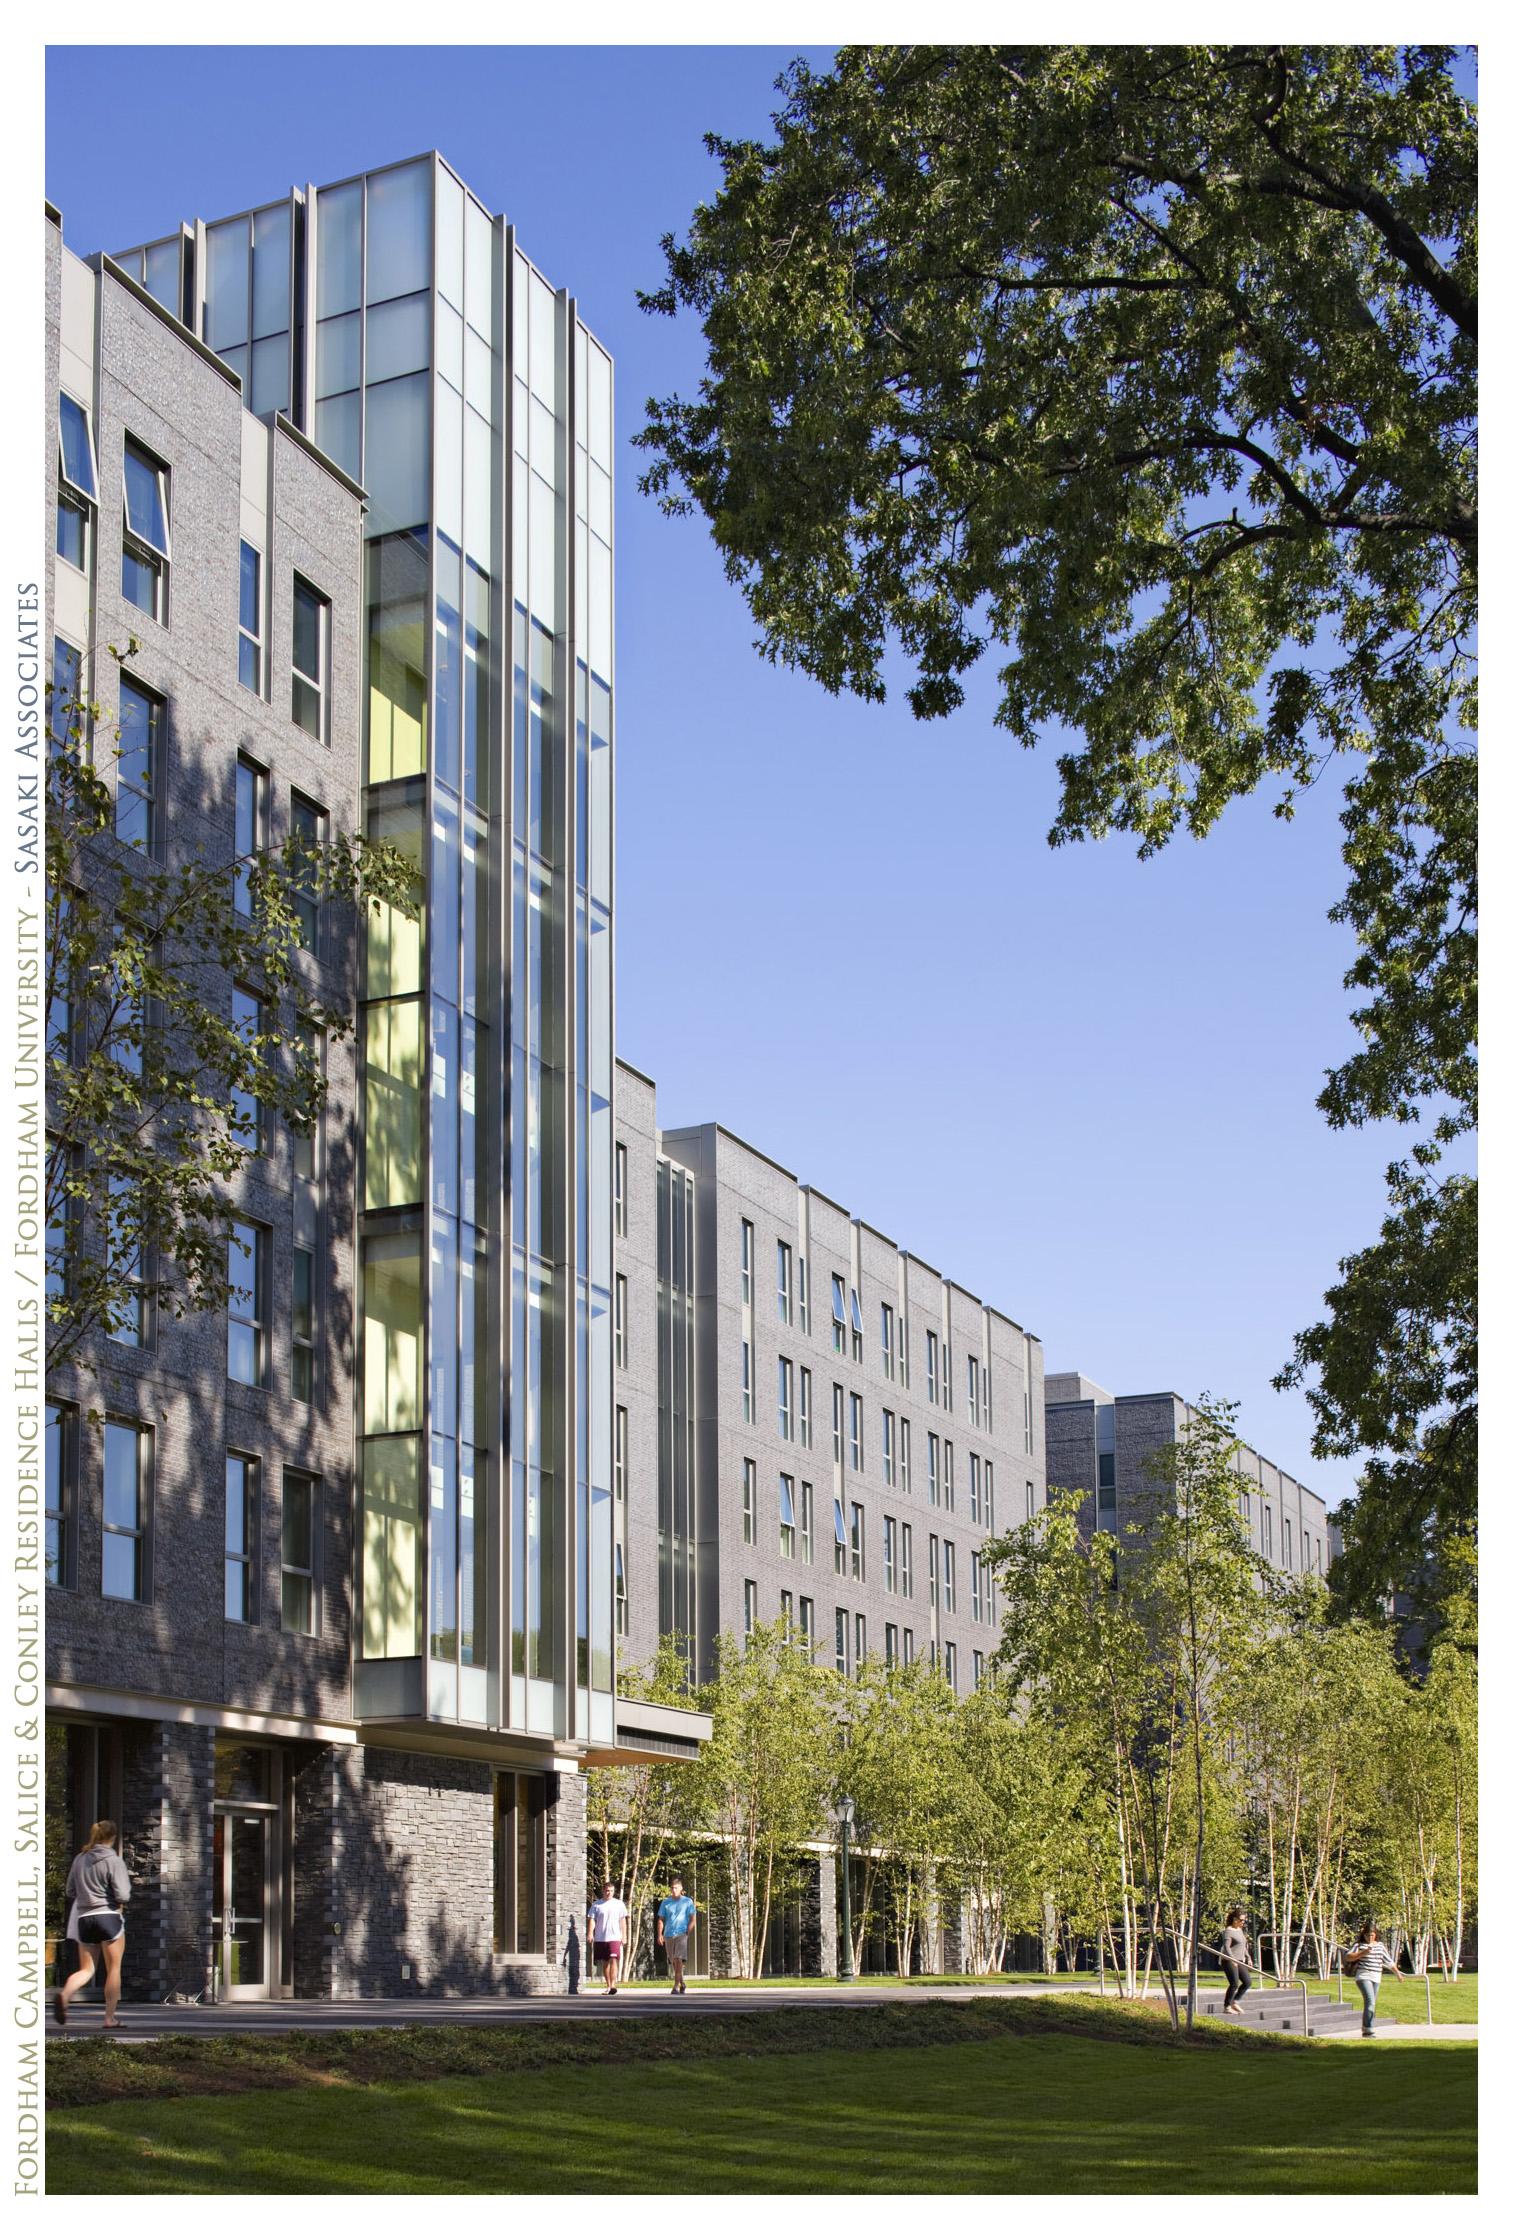 010_Robert-Benson-Photography-Sasaki-Fordham-University-Dorm-Student-Housing-Architectural-Photography-07.JPG